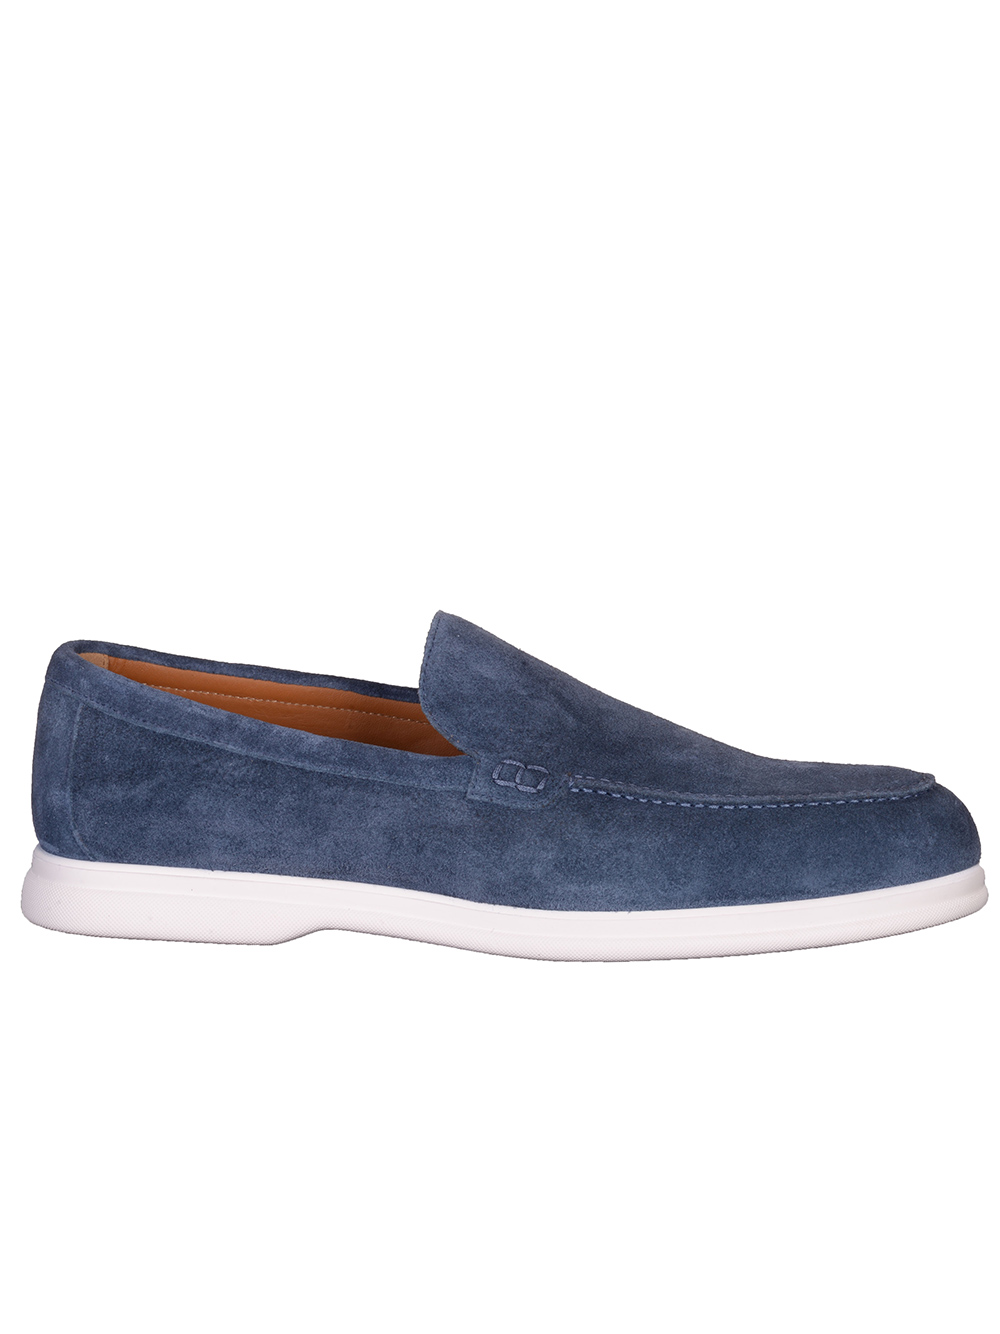 DOUCAL'S Παπούτσια μοκασίνι ARTHUΥ 106IB22 ΡΑΦ